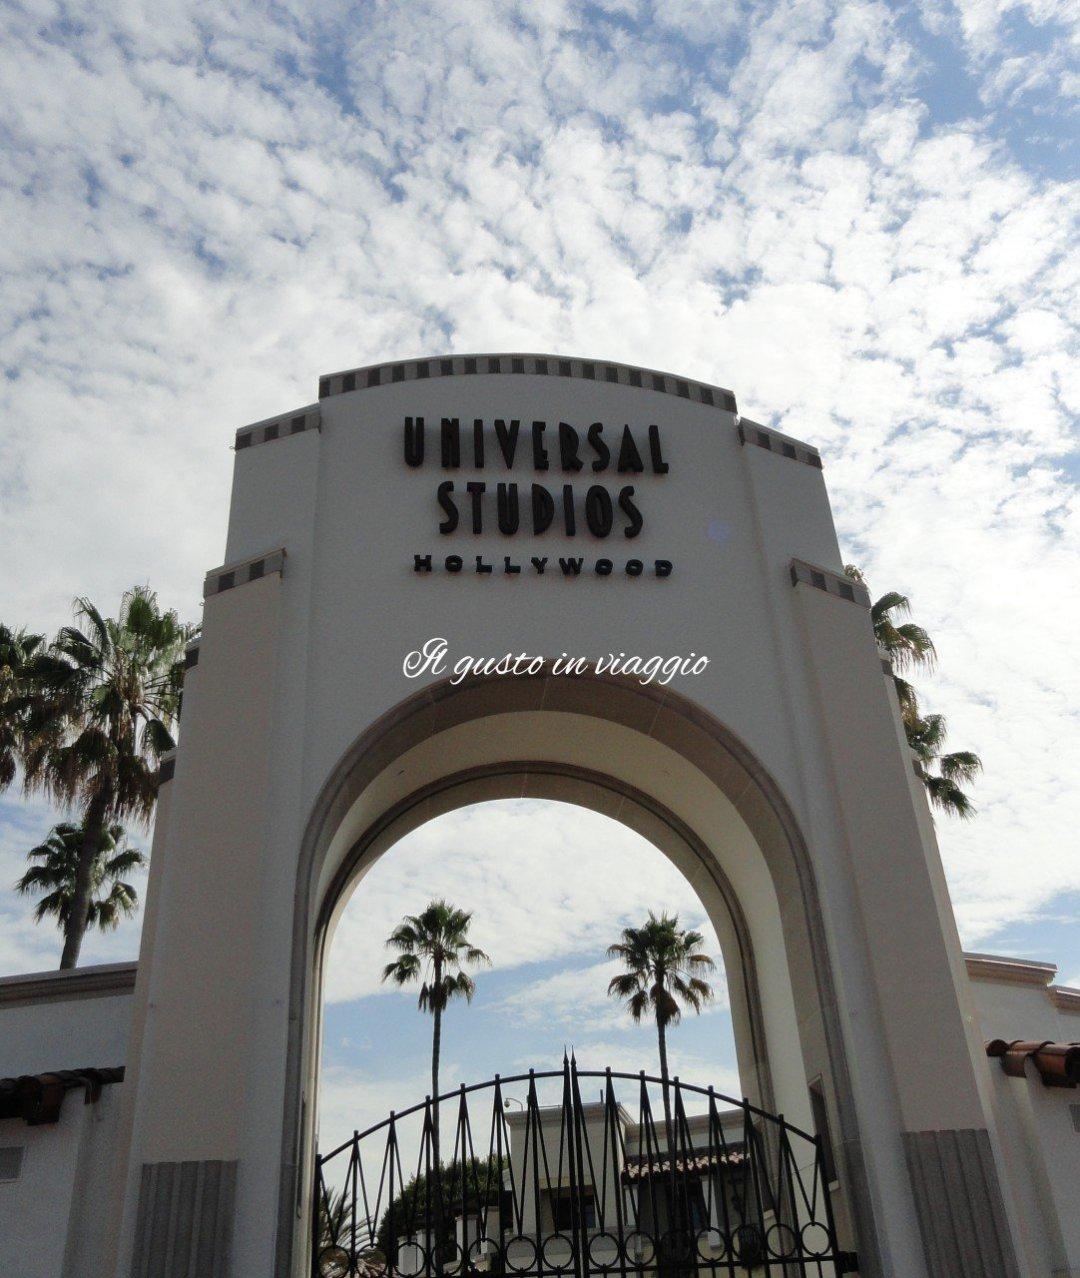 ingresso universal studios hollywood visitare gli universal studios los angeles